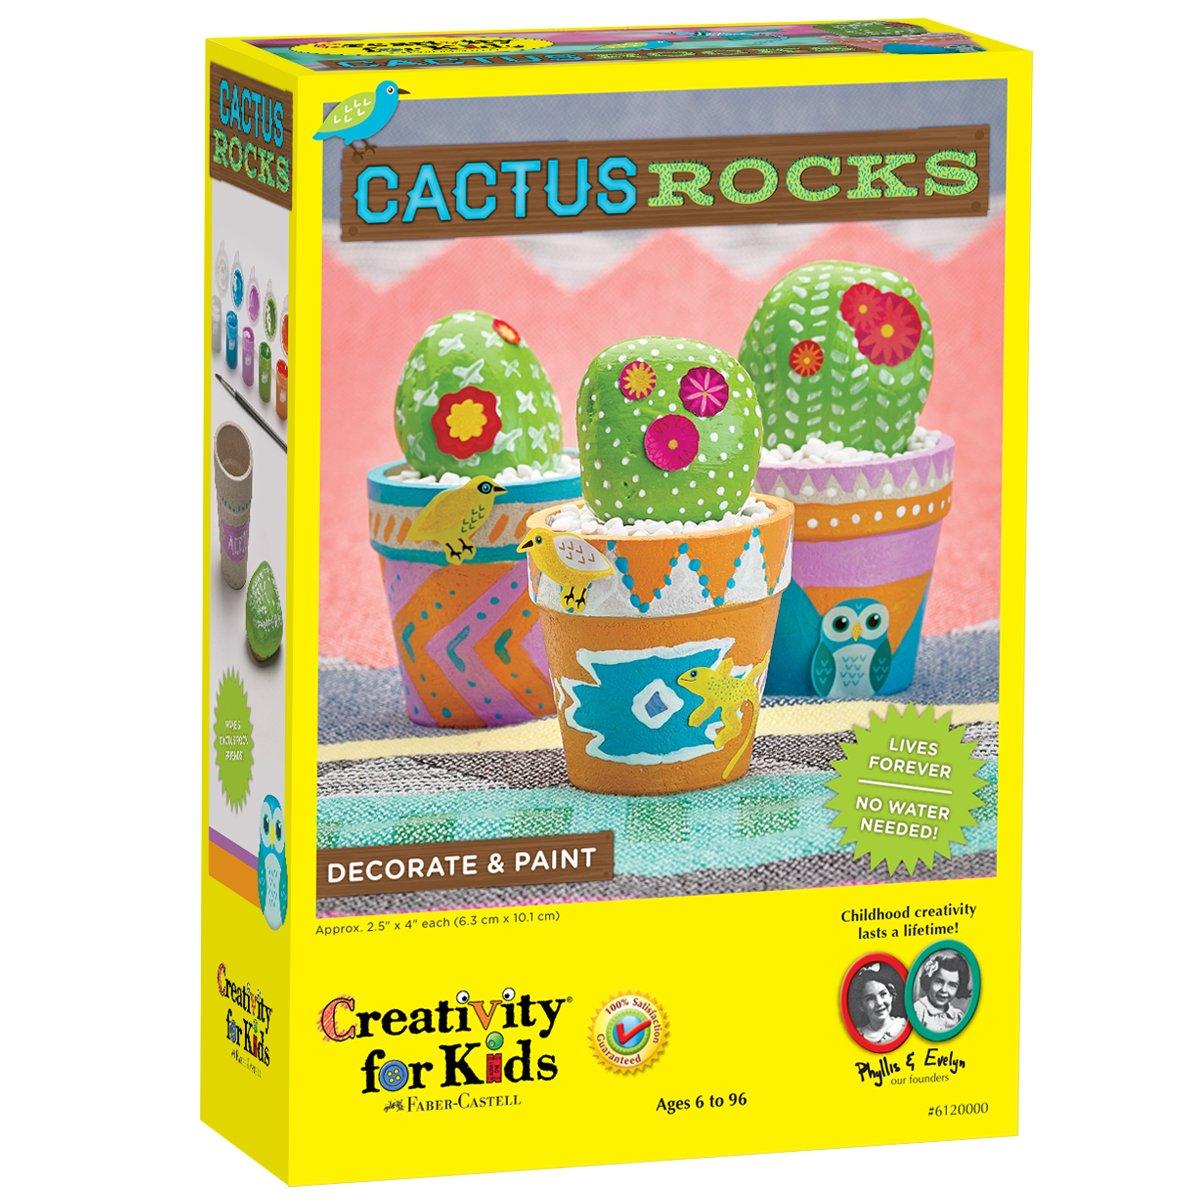 Creativity for Kids Cactus Rocks